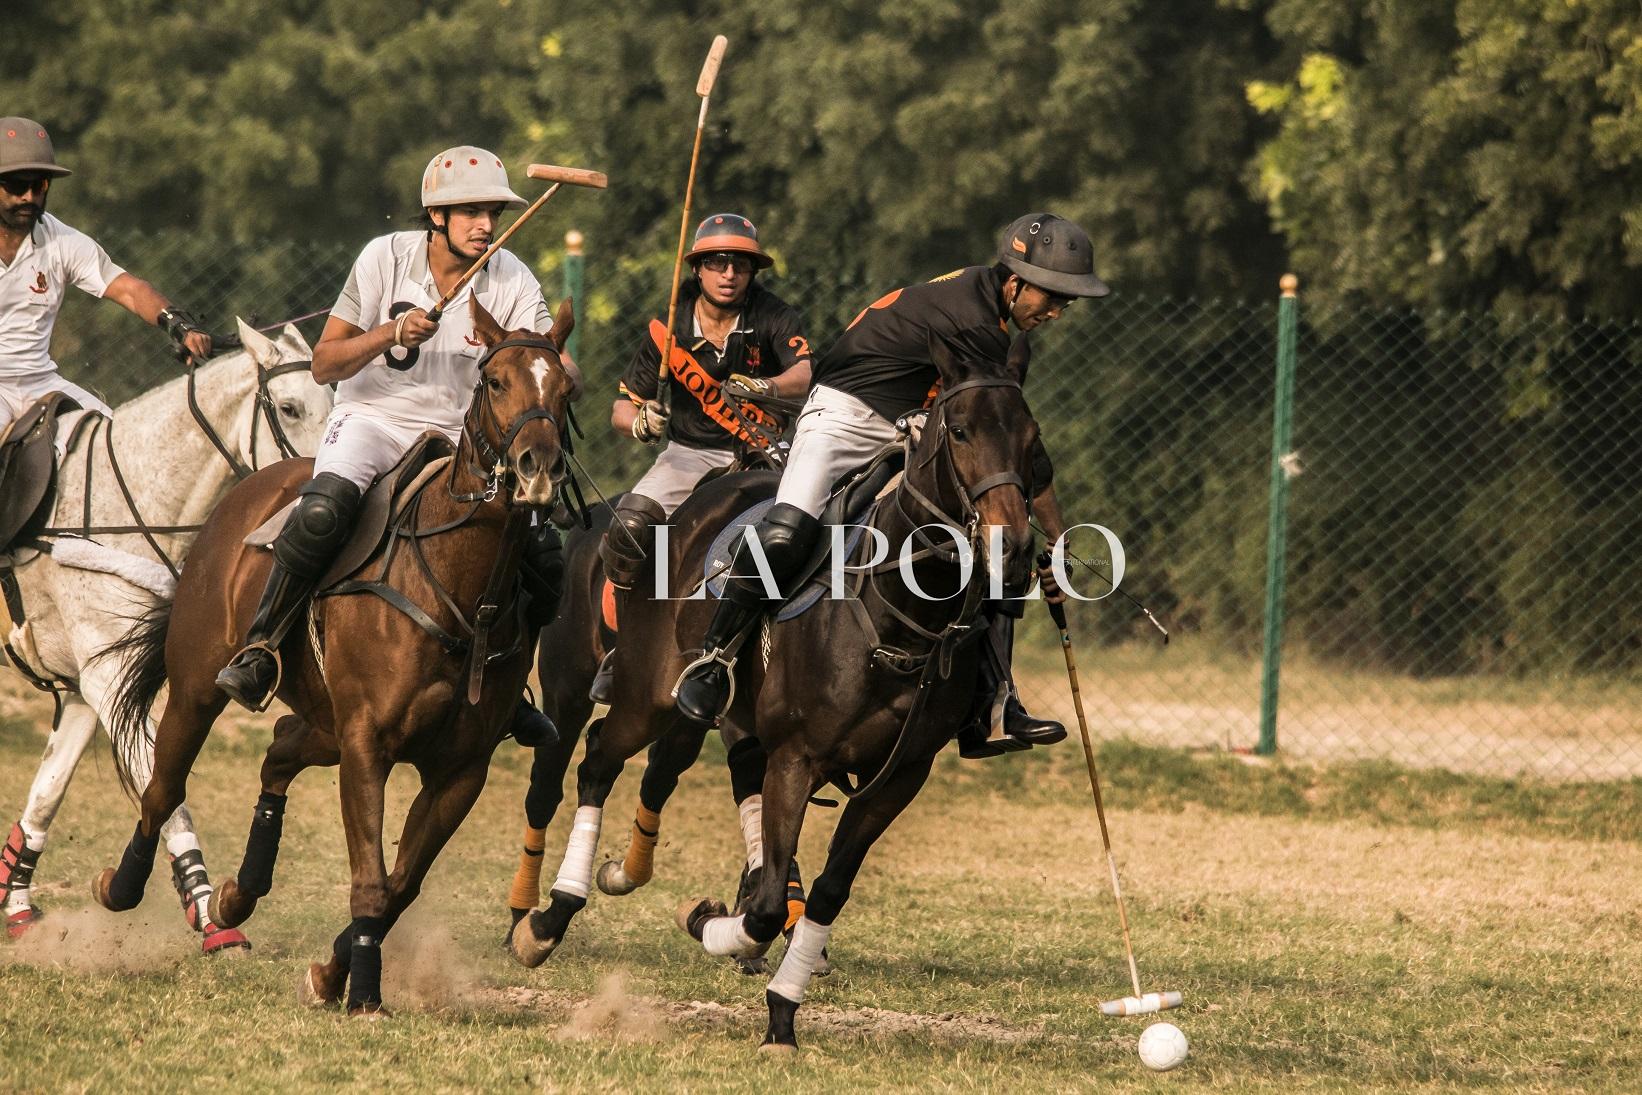 polo-in-jodhpur-arena-polo-types-of-polo-lapolo